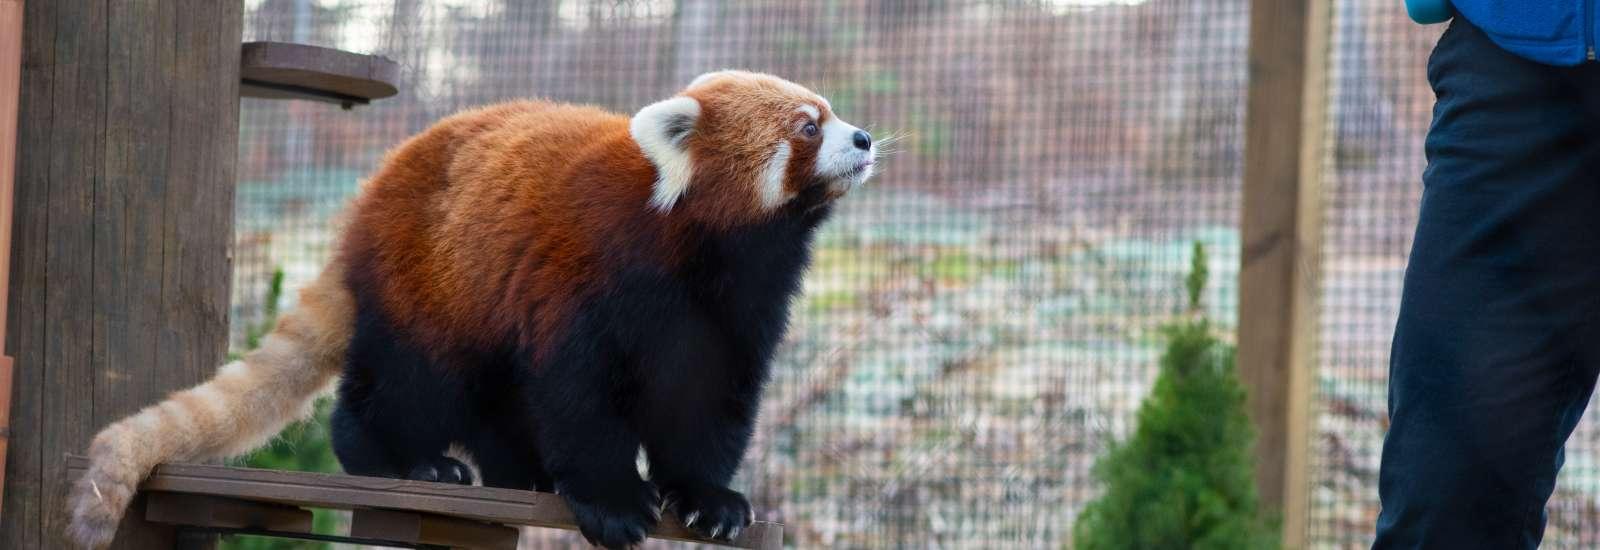 Red Panda Exhibit at WNC Nature Center